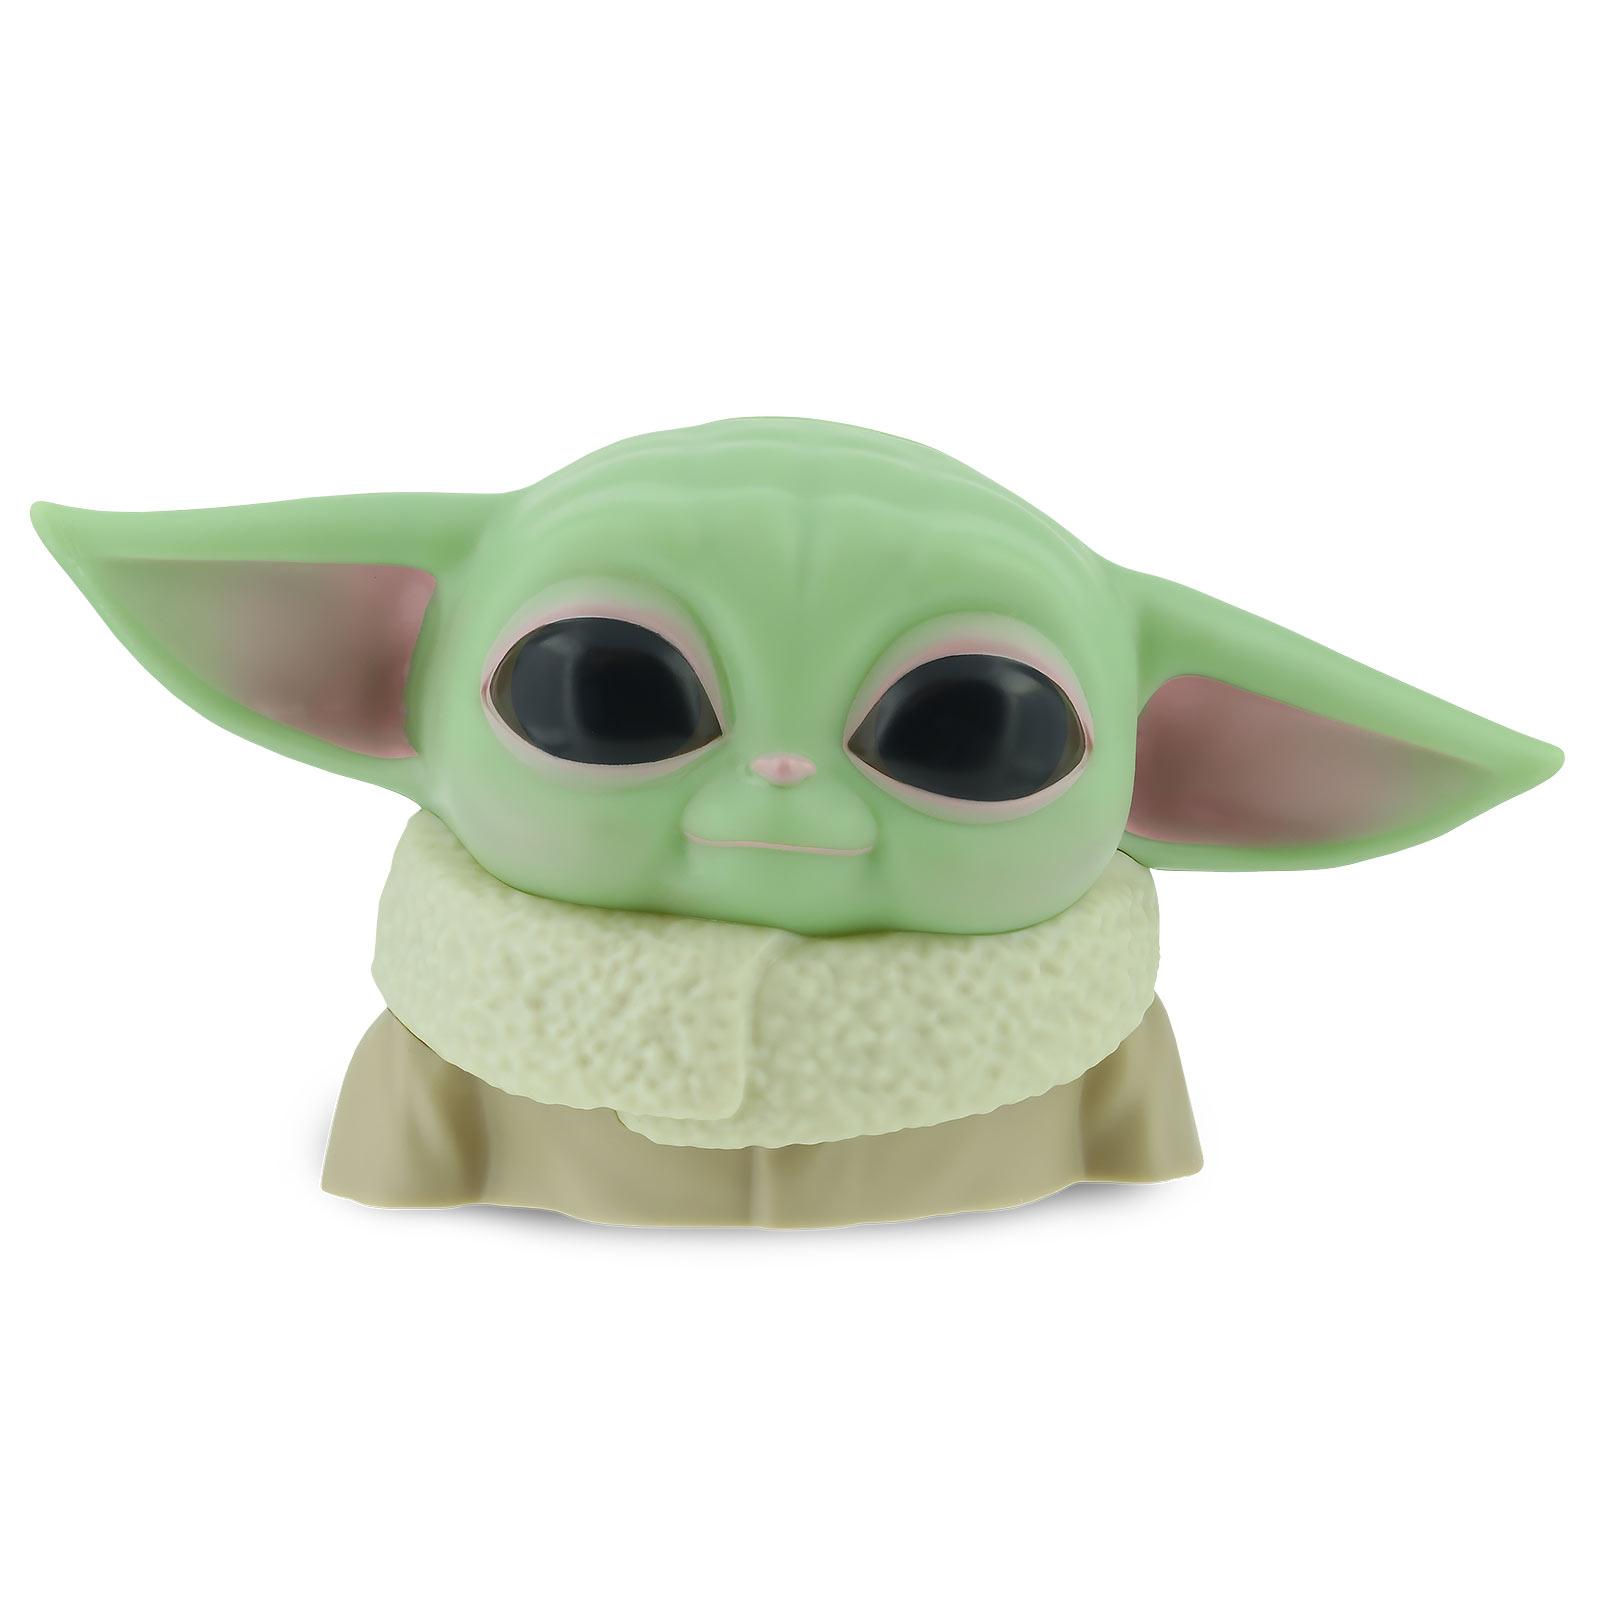 The Child 3D Tischlampe - Star Wars The Mandalorian